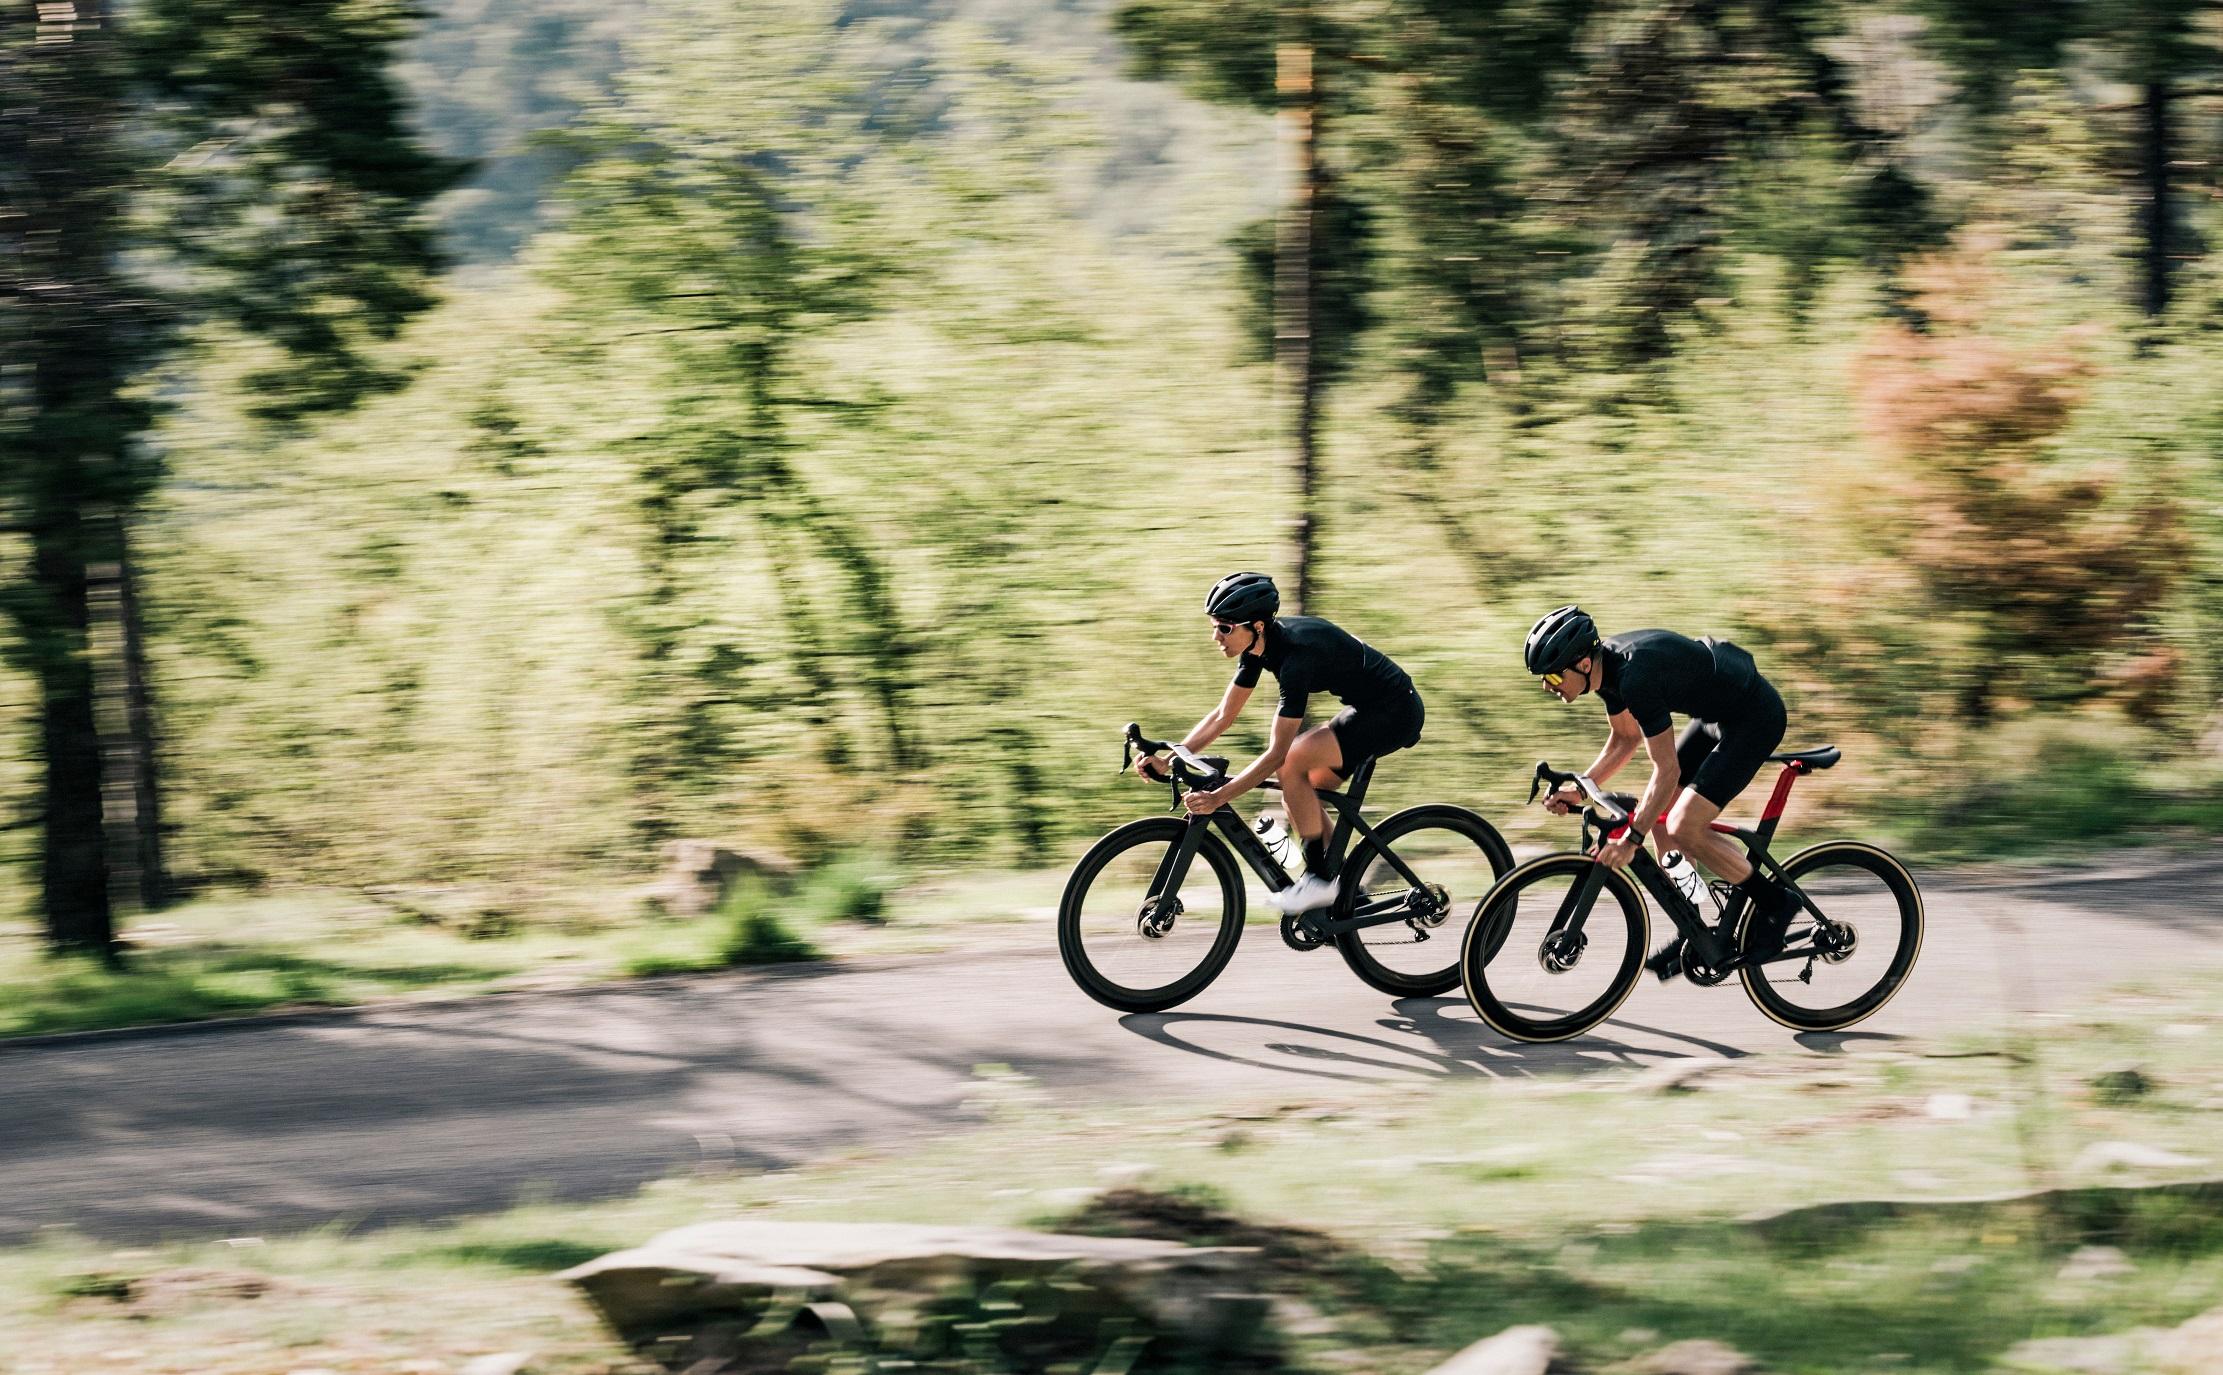 TREK Bicycle 宇都宮 3月ストアイベントのお知らせ